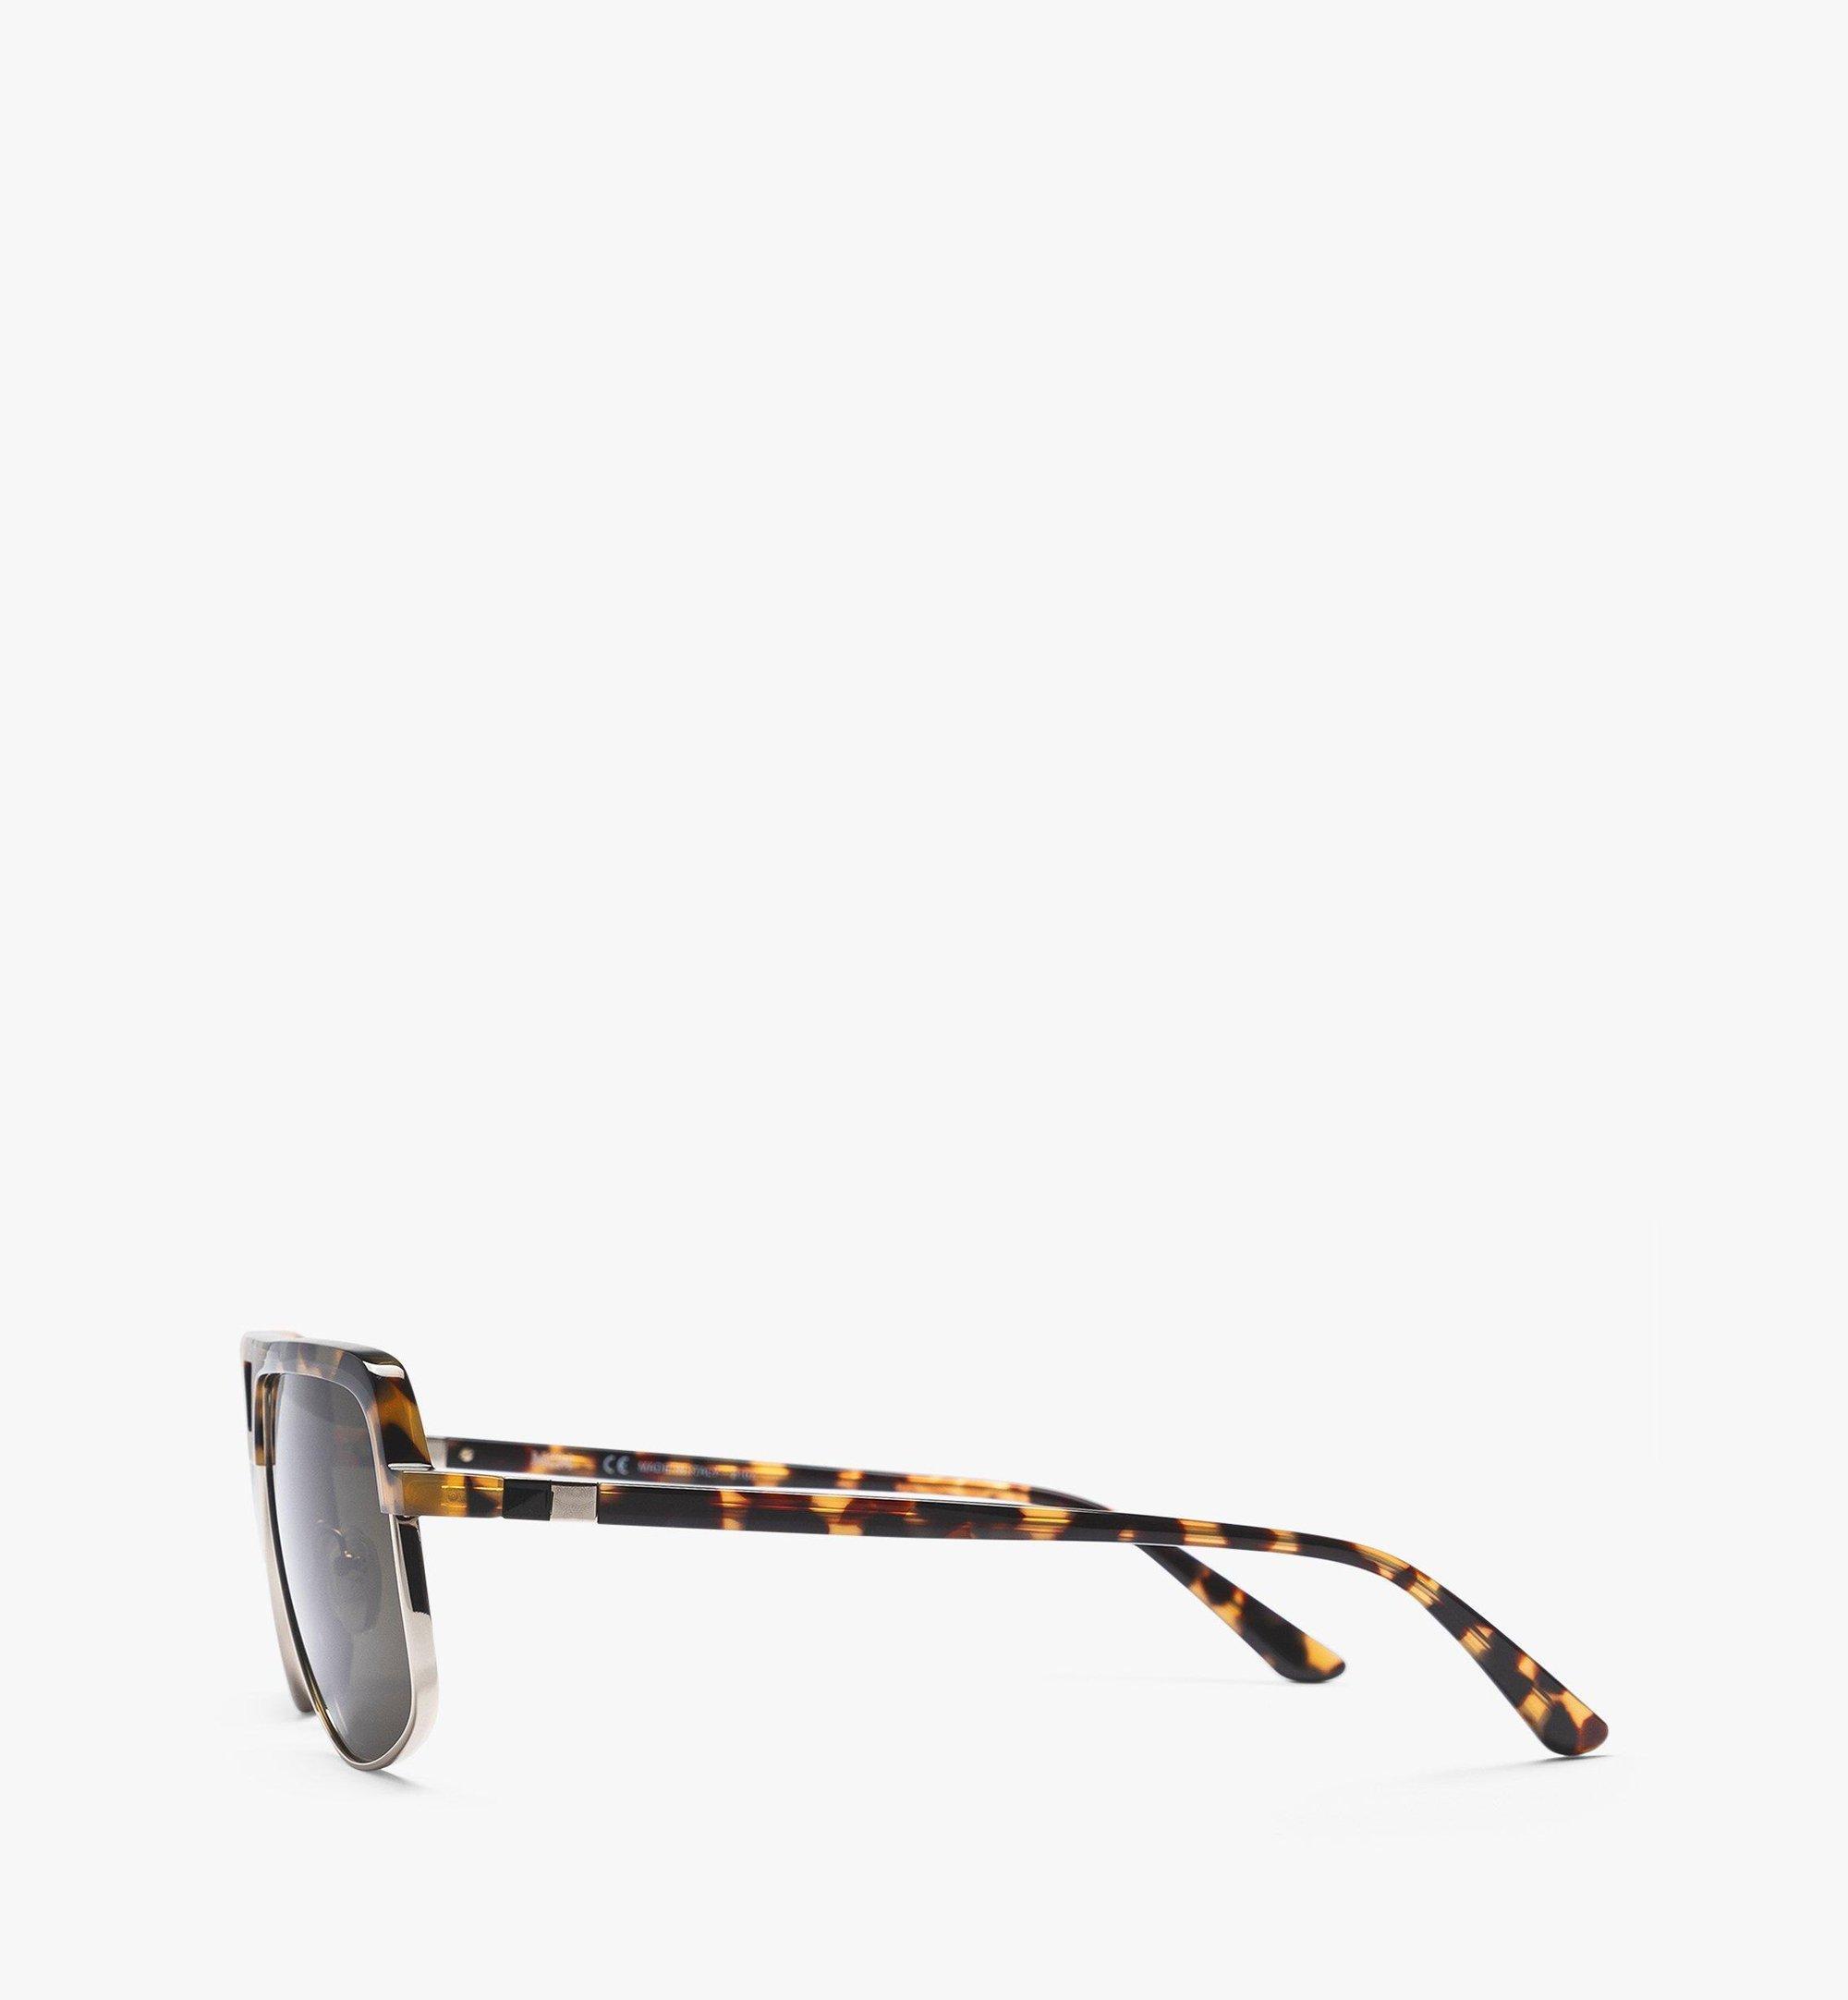 MCM MCM708S Navigator Sunglasses Brown MEGBAMM04NH001 Alternate View 1